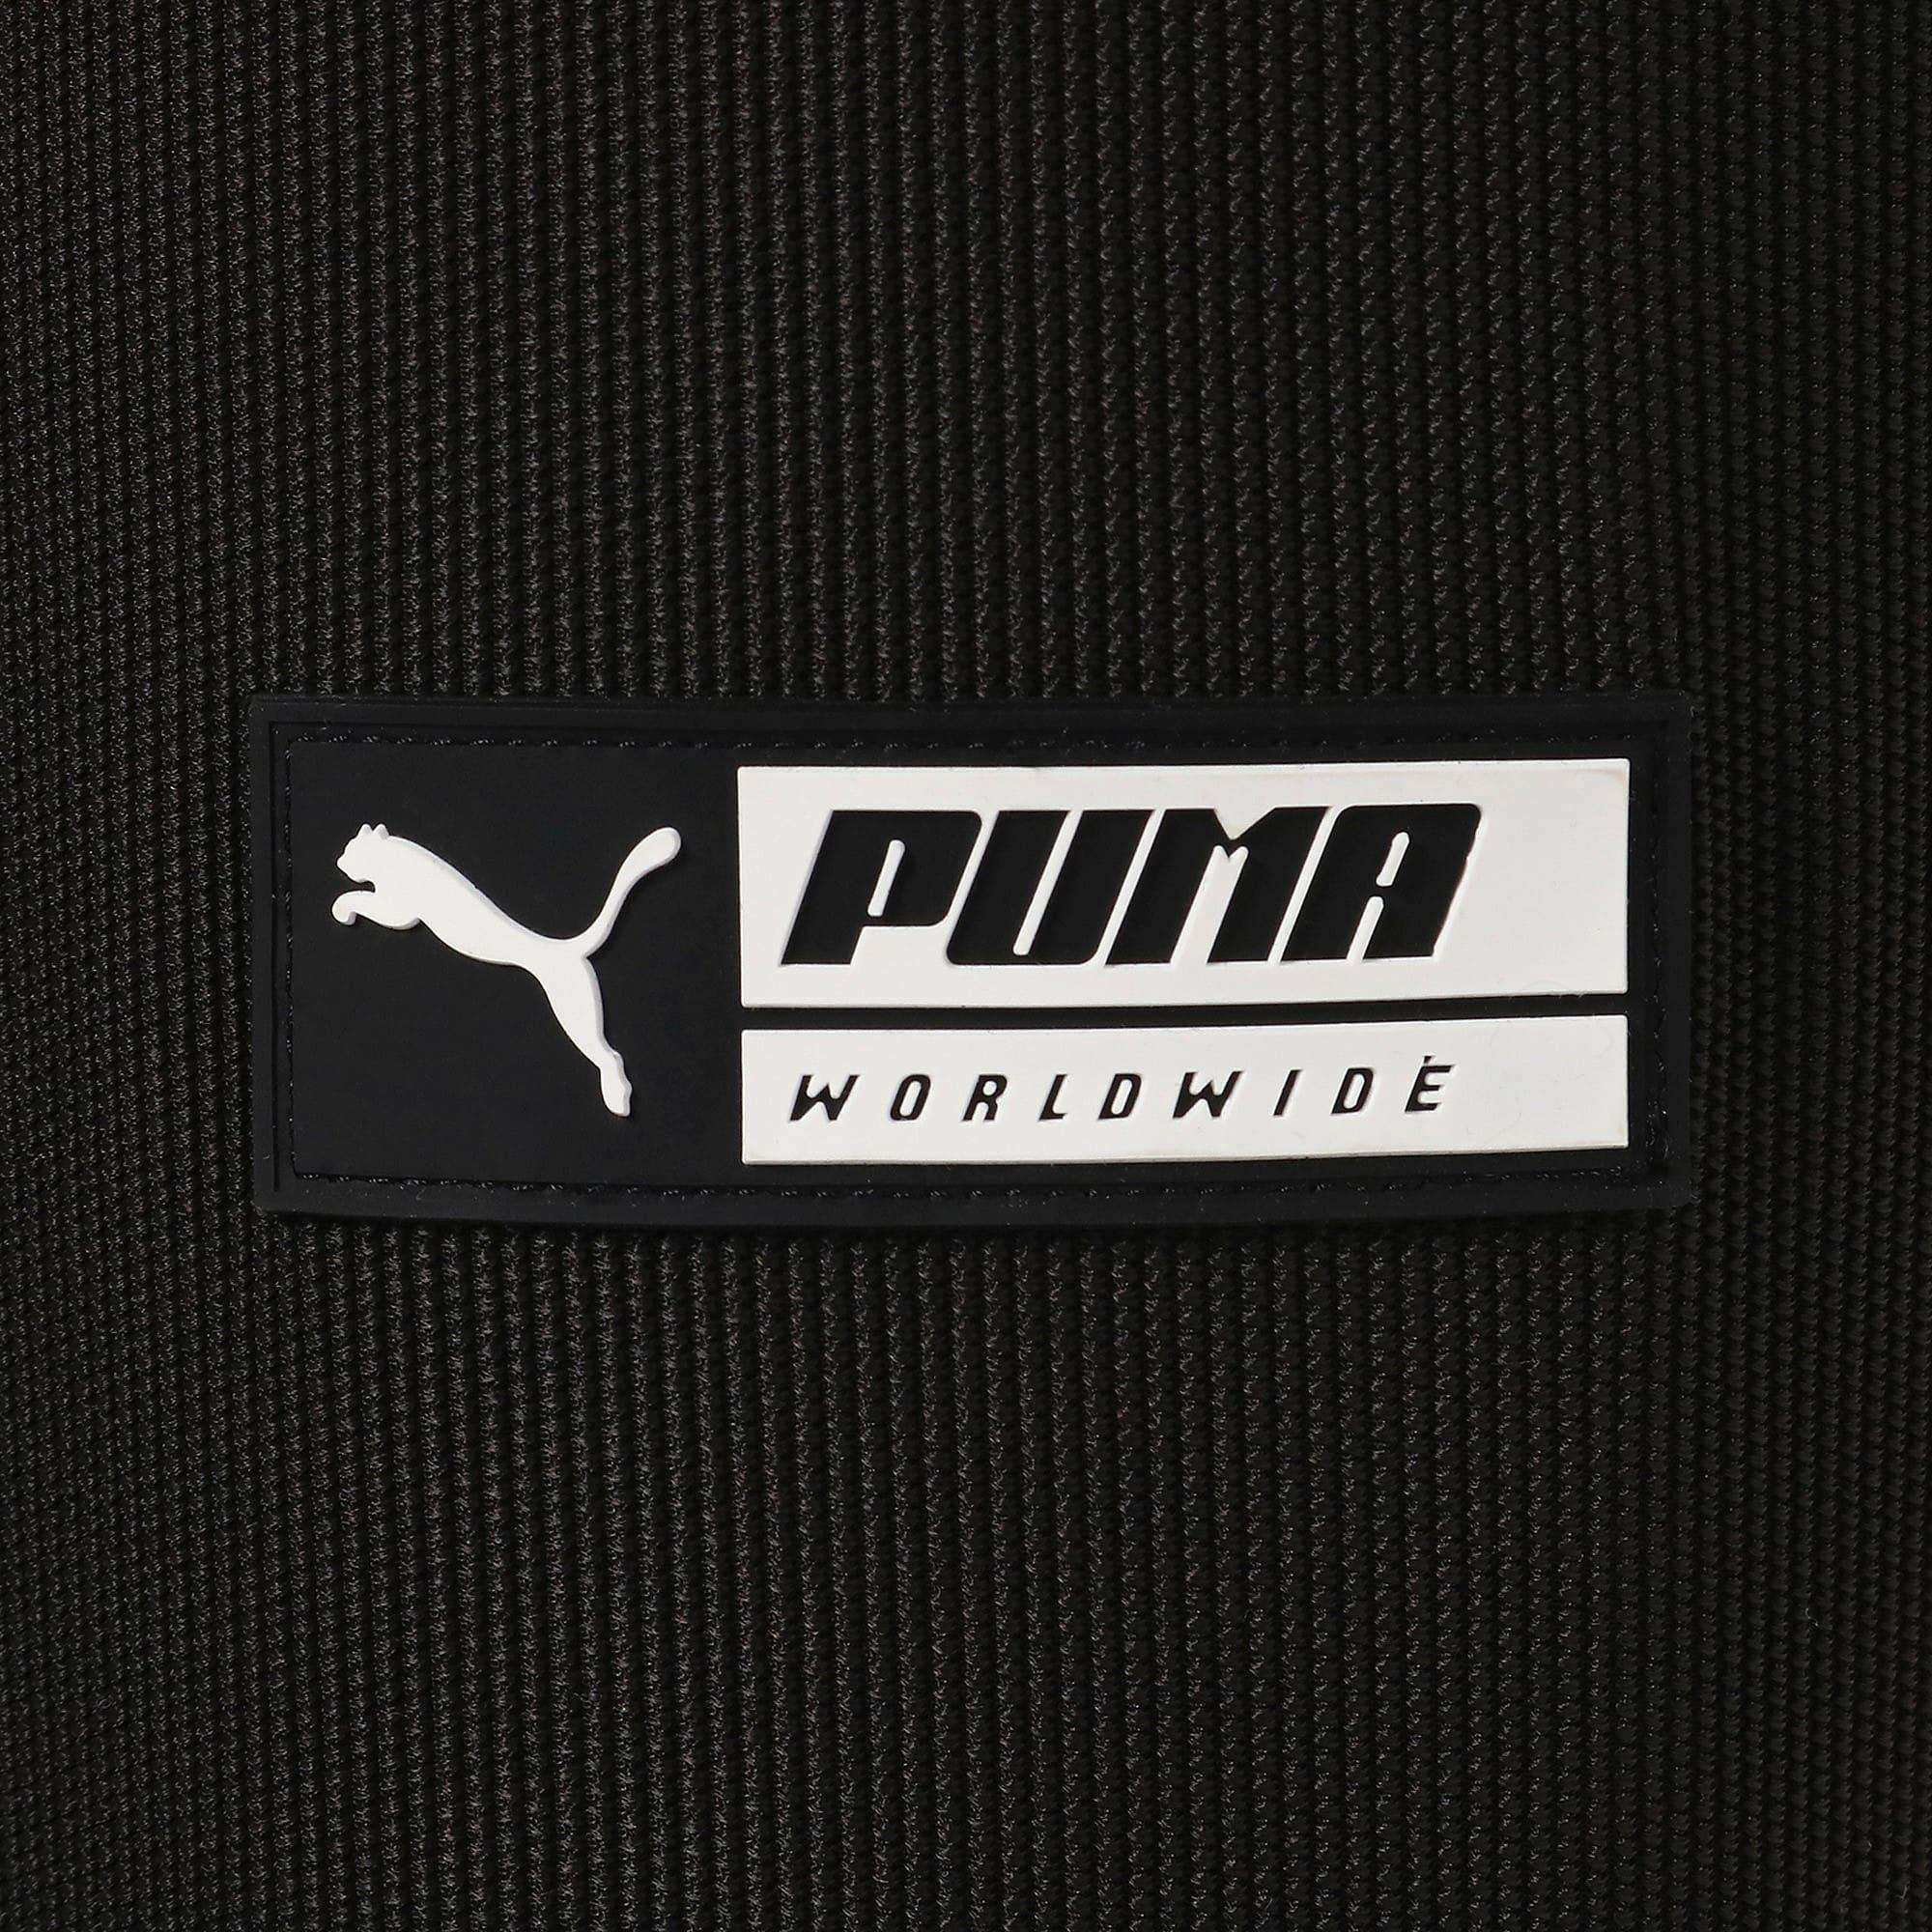 Thumbnail 7 of TZ ウィメンズ レギンス, Puma Black, medium-JPN